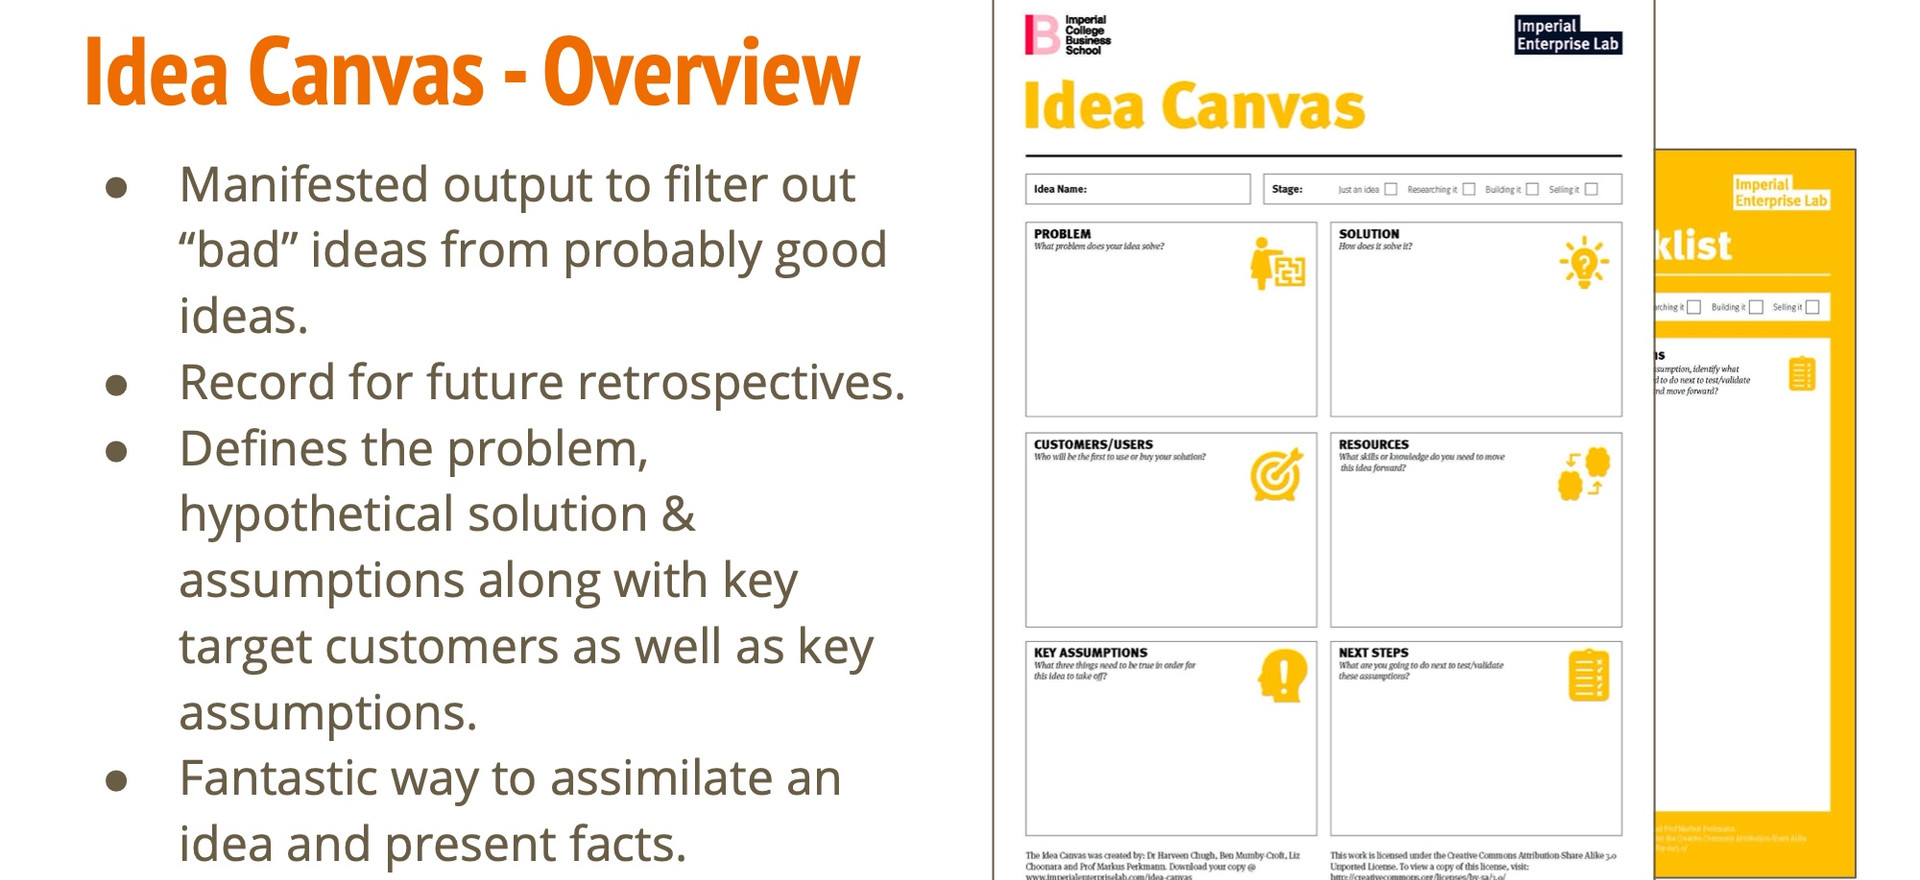 Idea Canvas - Overview